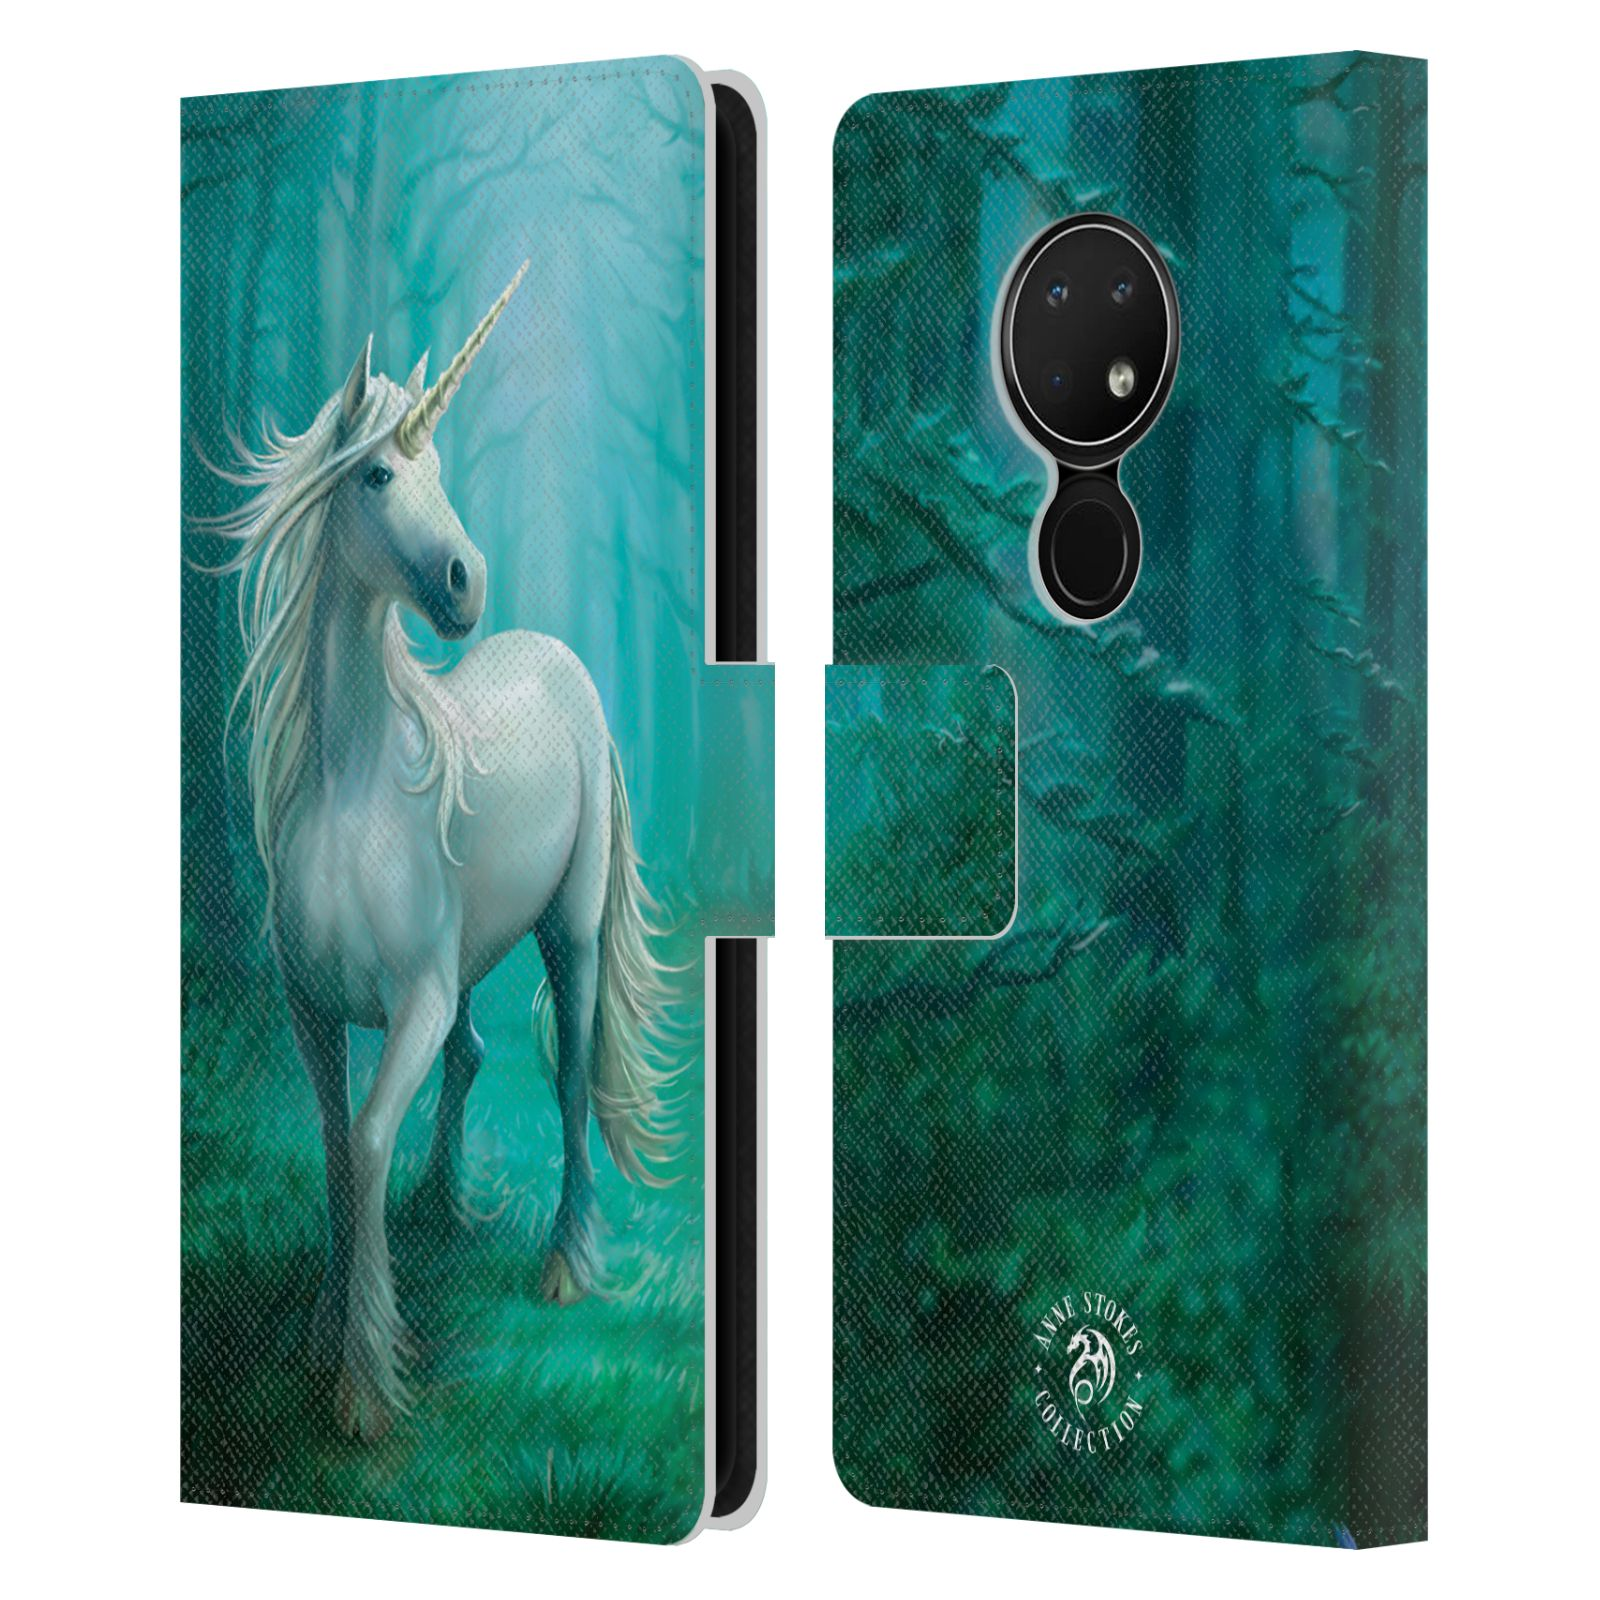 Pouzdro na mobil Nokia 6.2 - Head Case - fantasy - jednorožec v lese